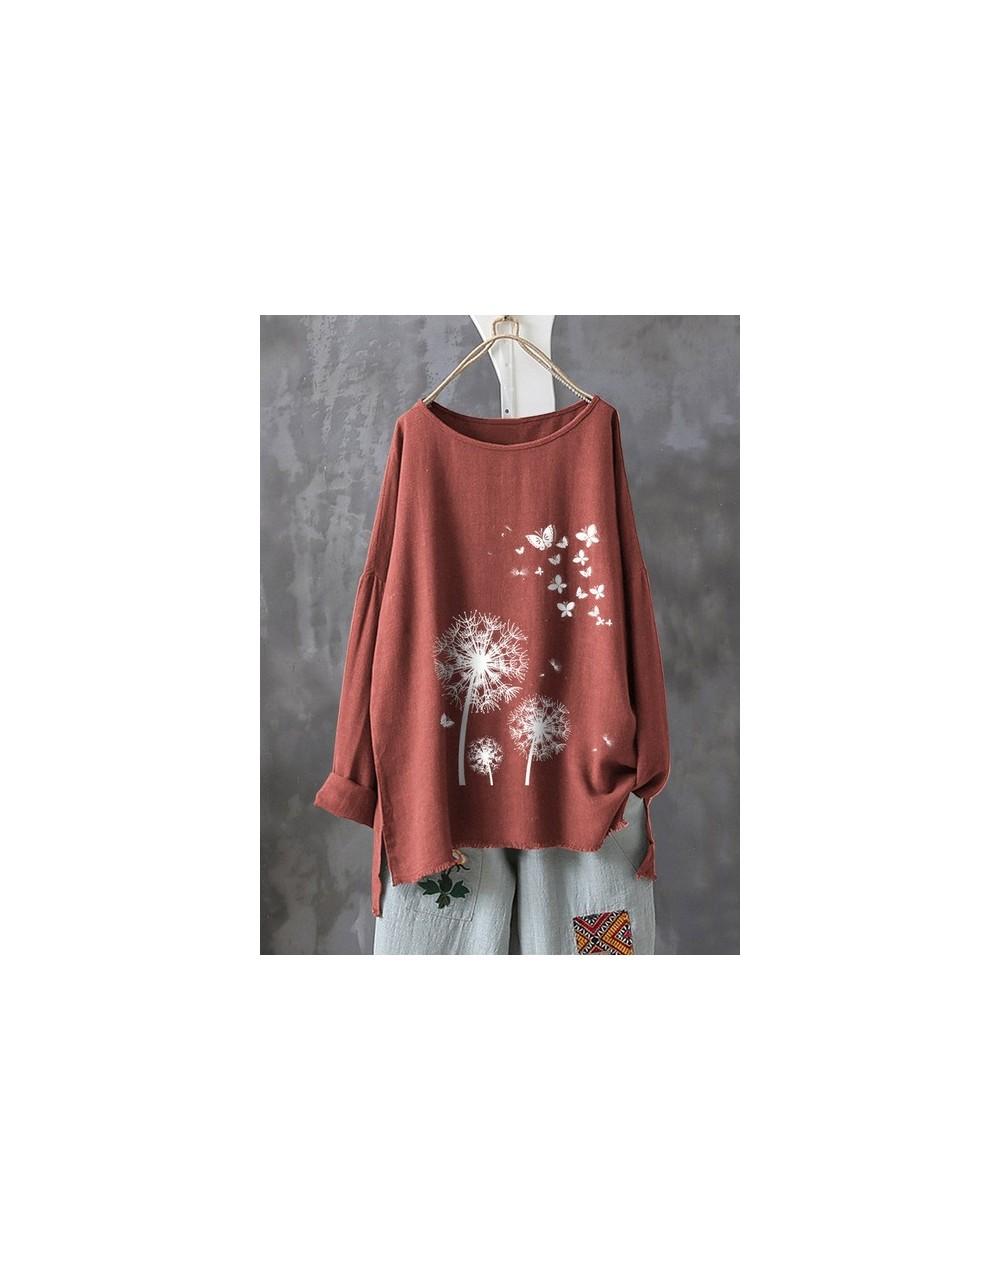 Dandelion Butterfly Printed Cotton Linen Tshirt Women Long Sleeve Split Pullover Tops Loose 4XL 5XL Plus Size Ropa Femme T-S...